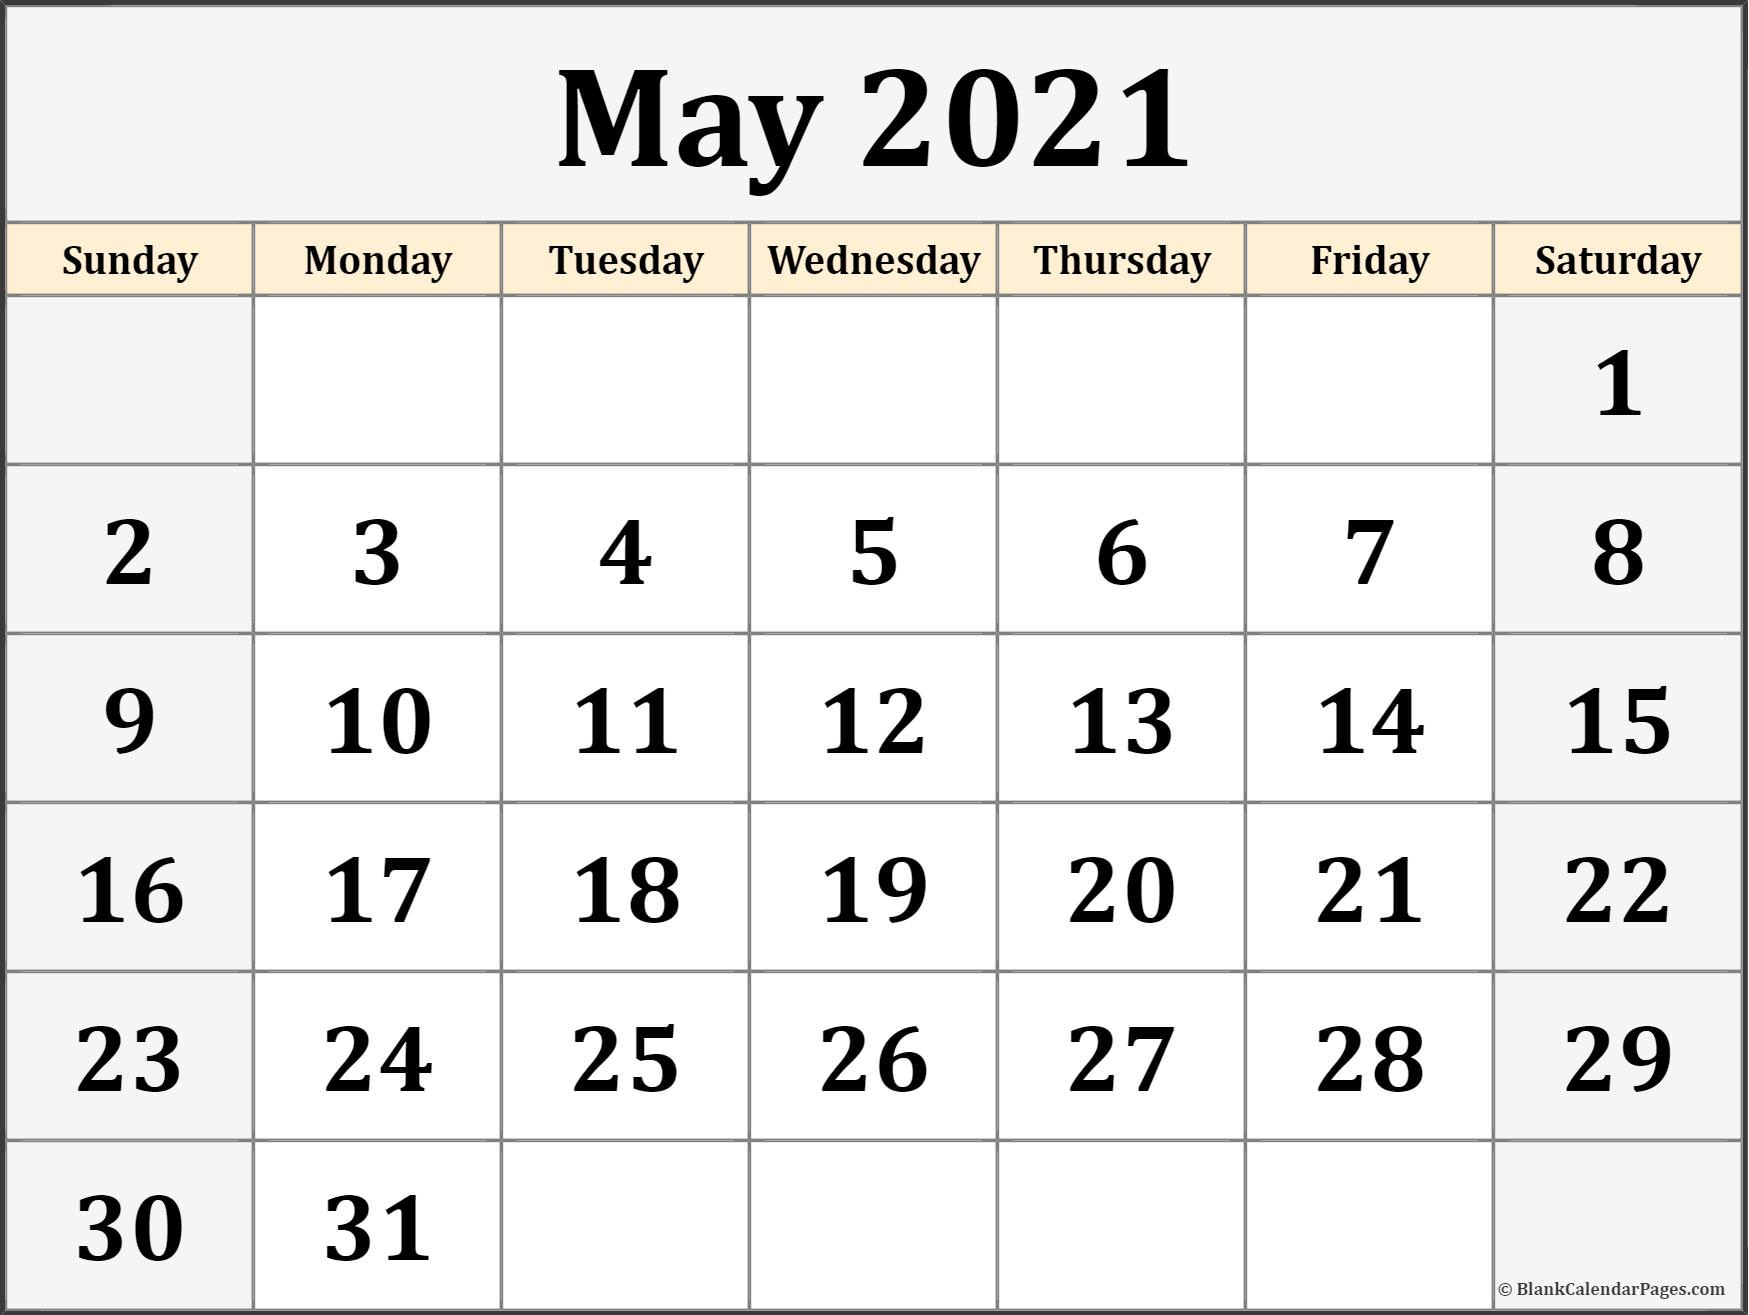 May 2021 Calendar | Free Printable Calendar Templates regarding Blank Monthly Calendar 2021